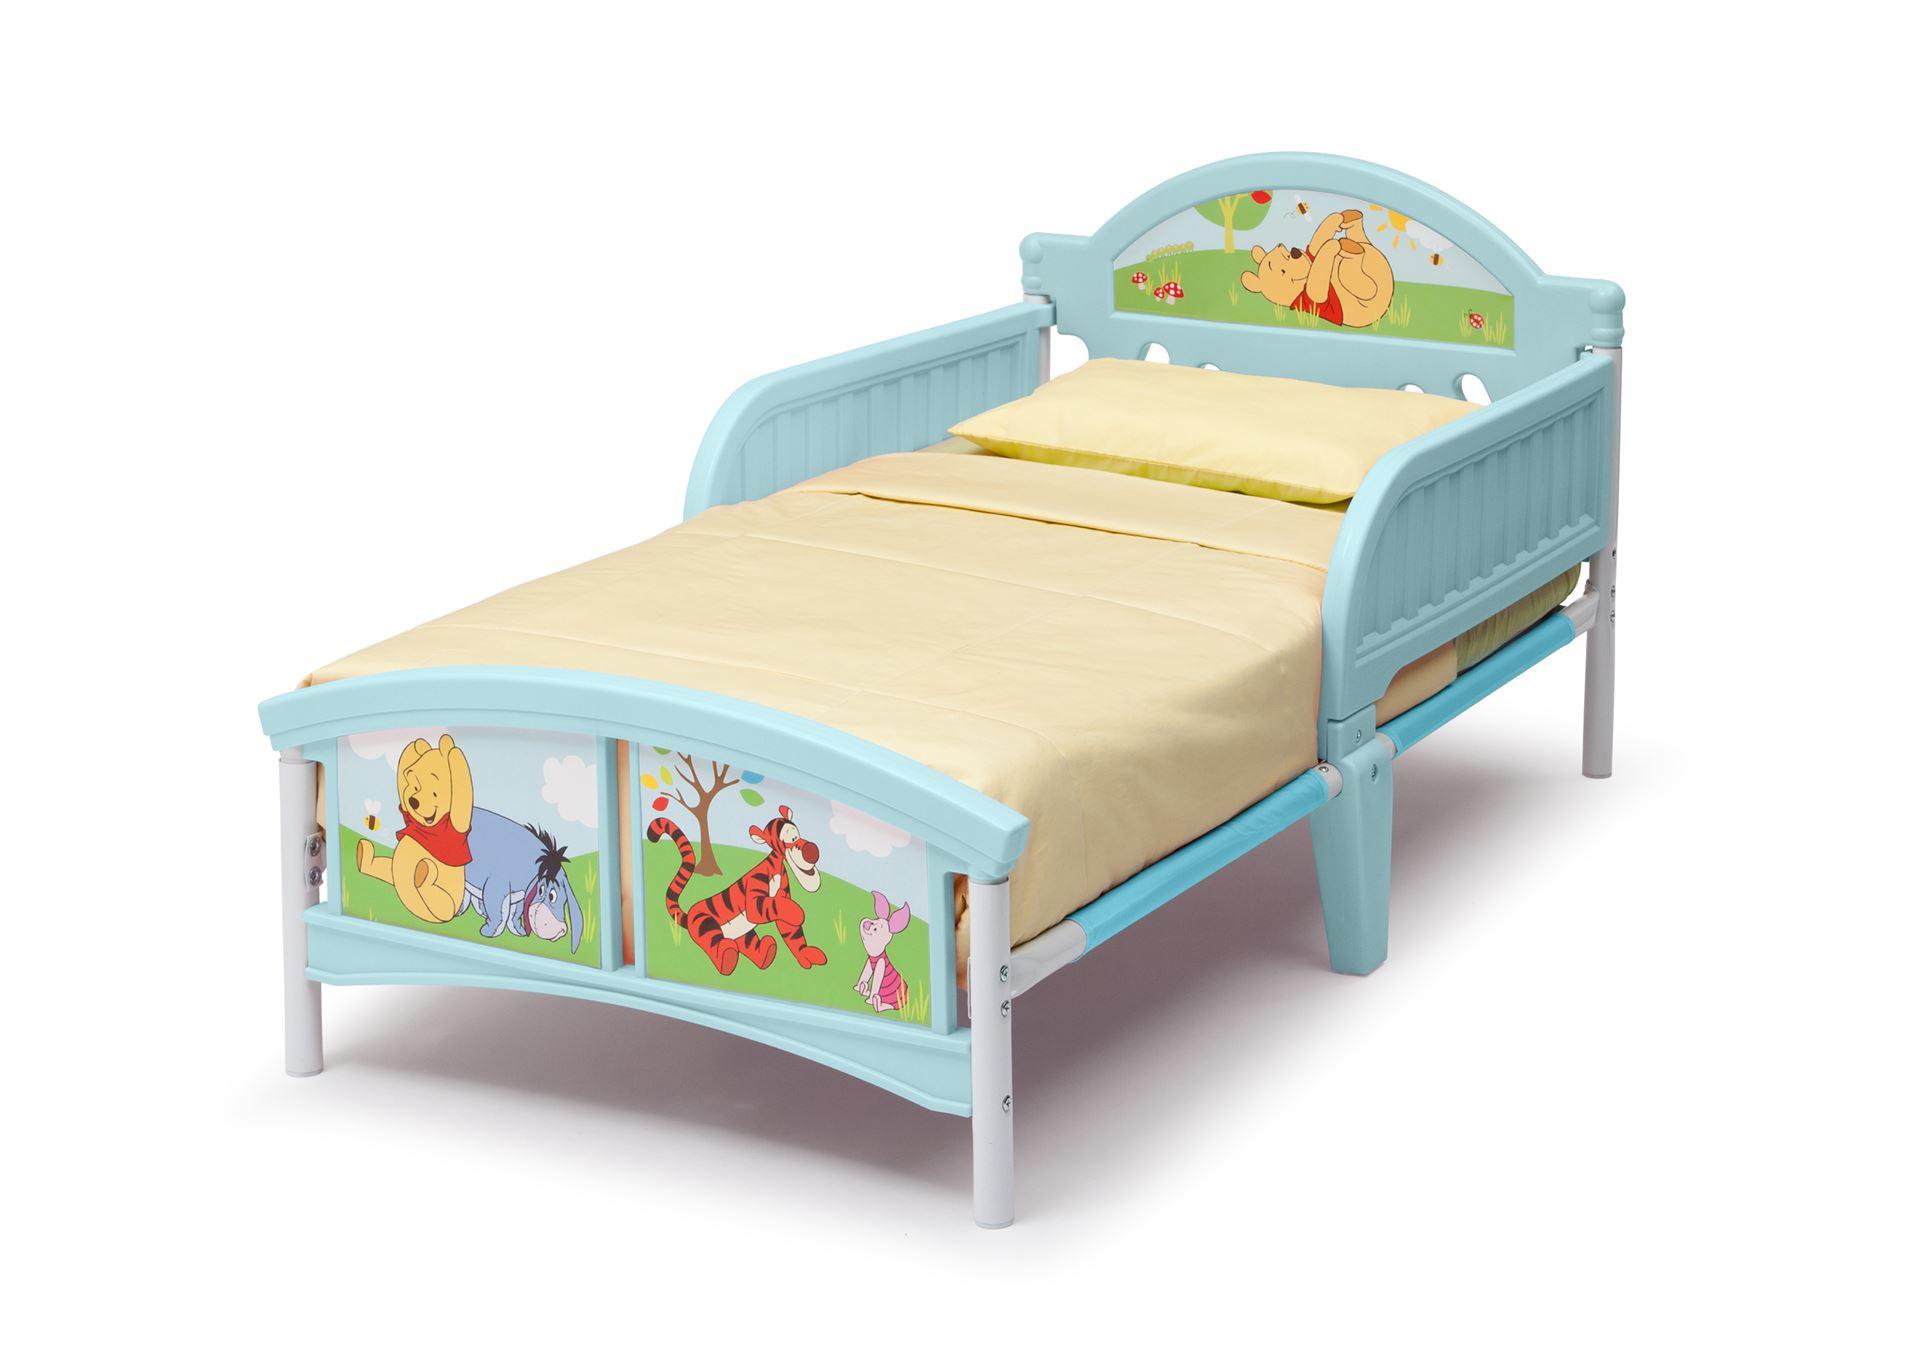 Dětská postel Medvídek Pú 140x70cm